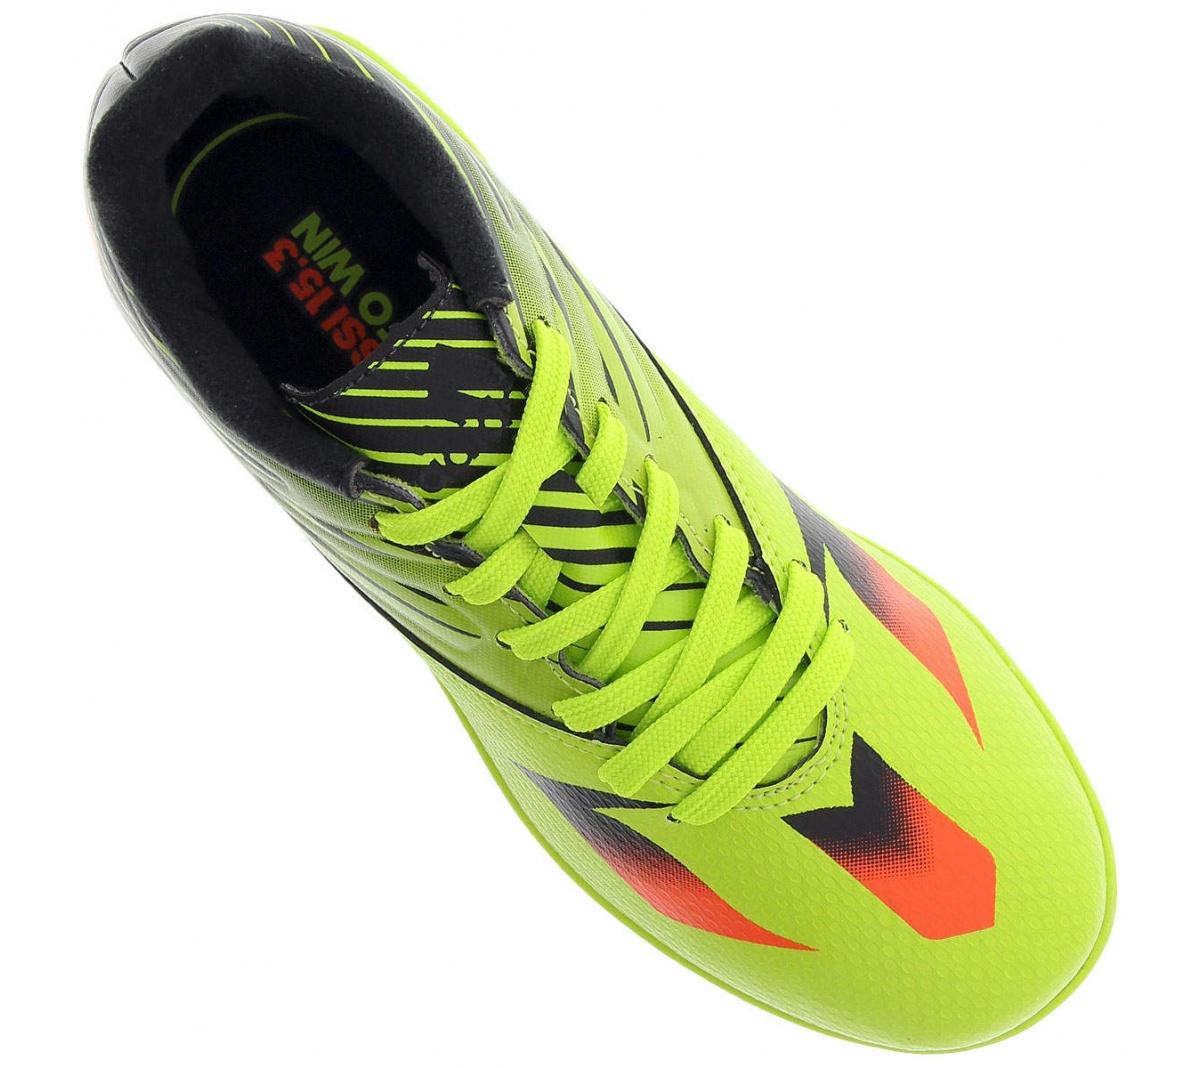 bf2e2c0819207 Tênis Adidas Messi 15.3 In Futsal Infantil - Mundo do Futebol